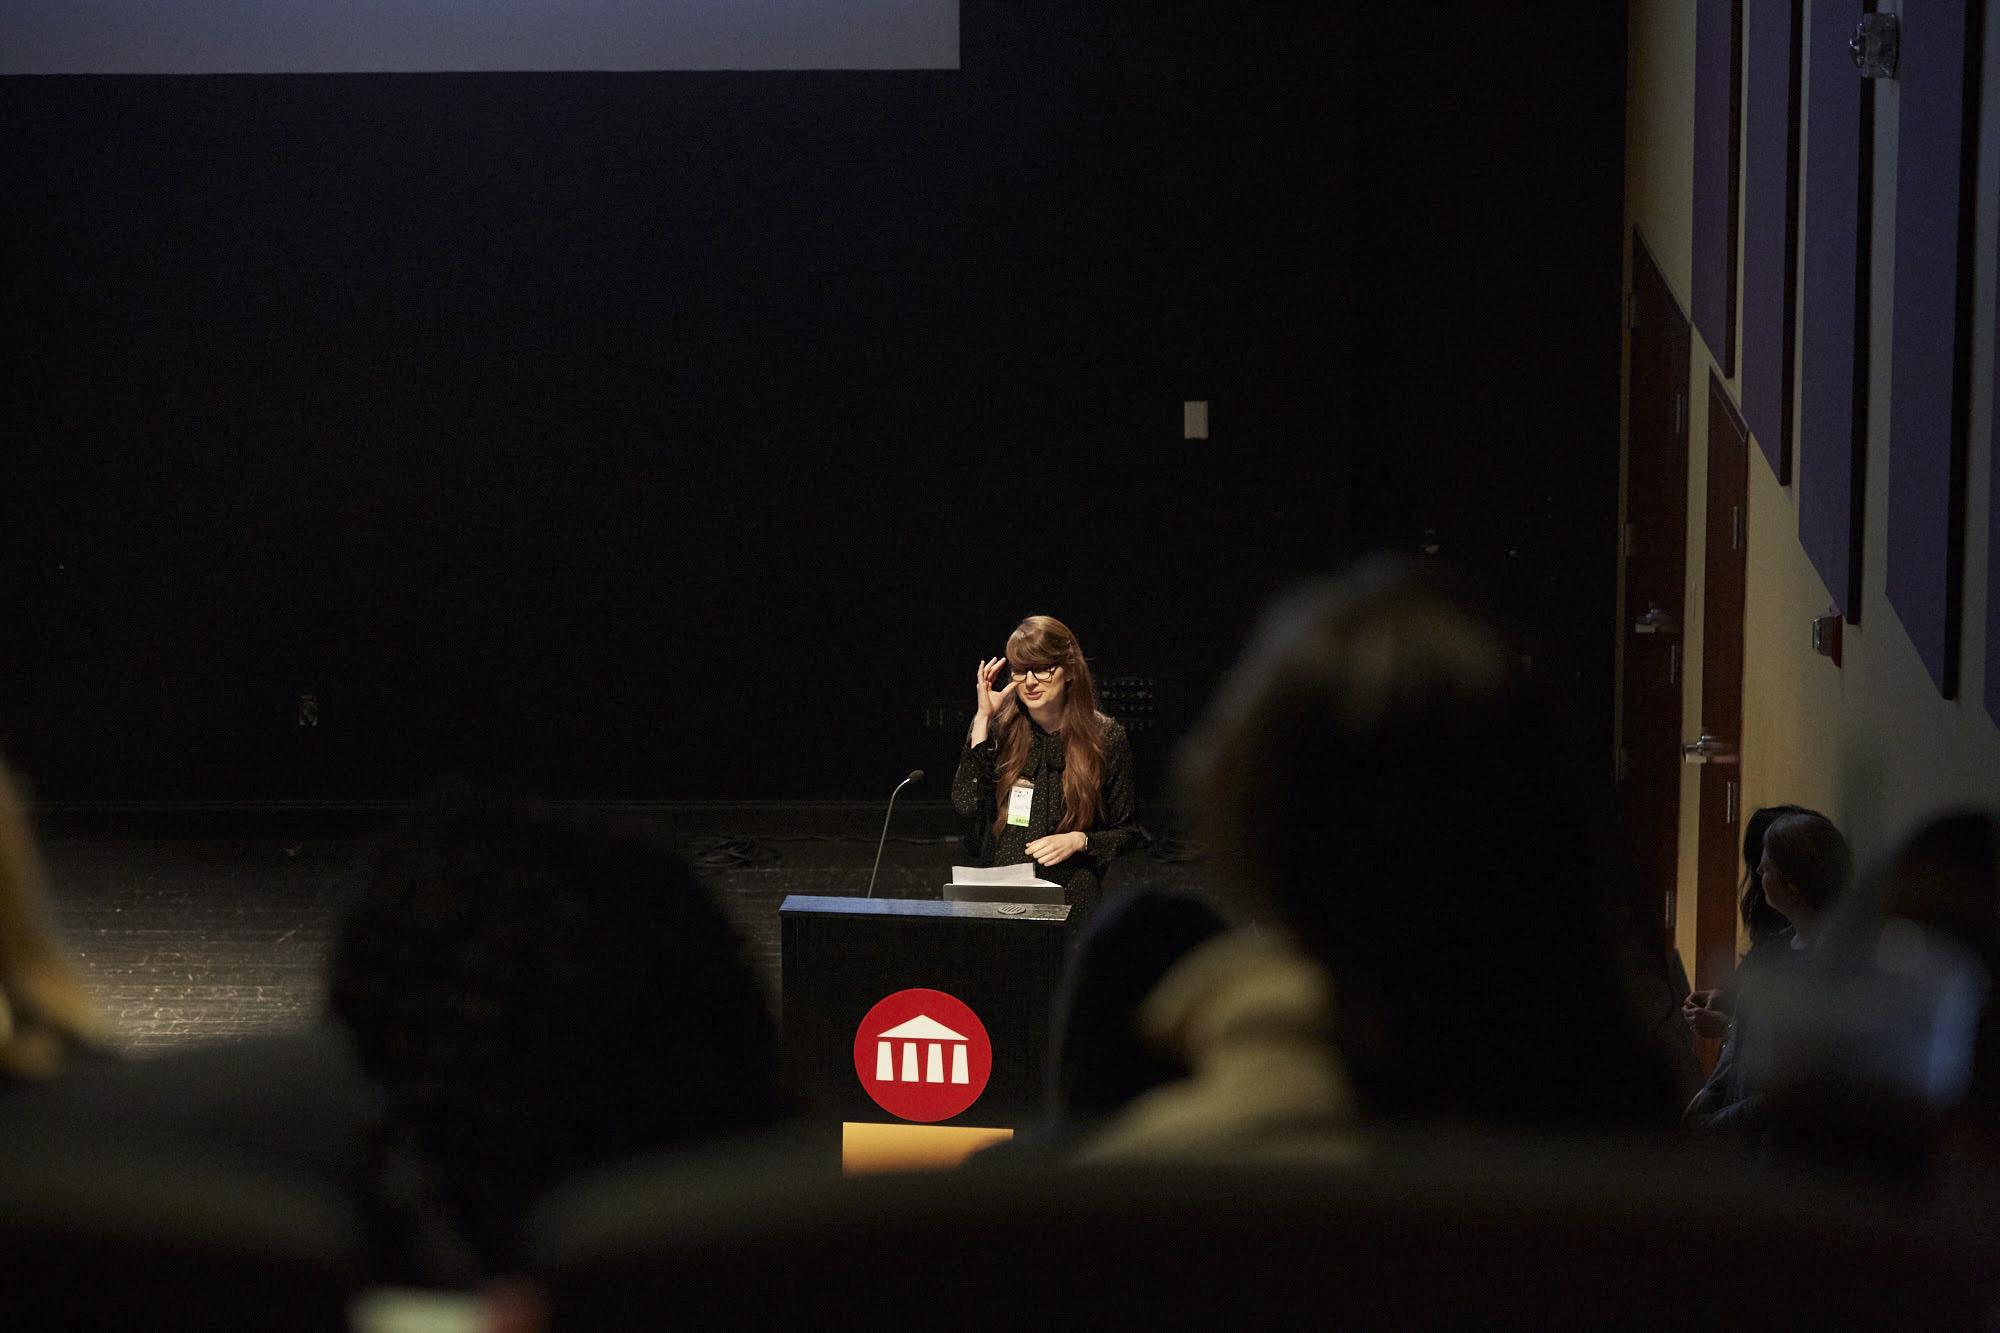 Photo of Joni Trythall at podium speaking